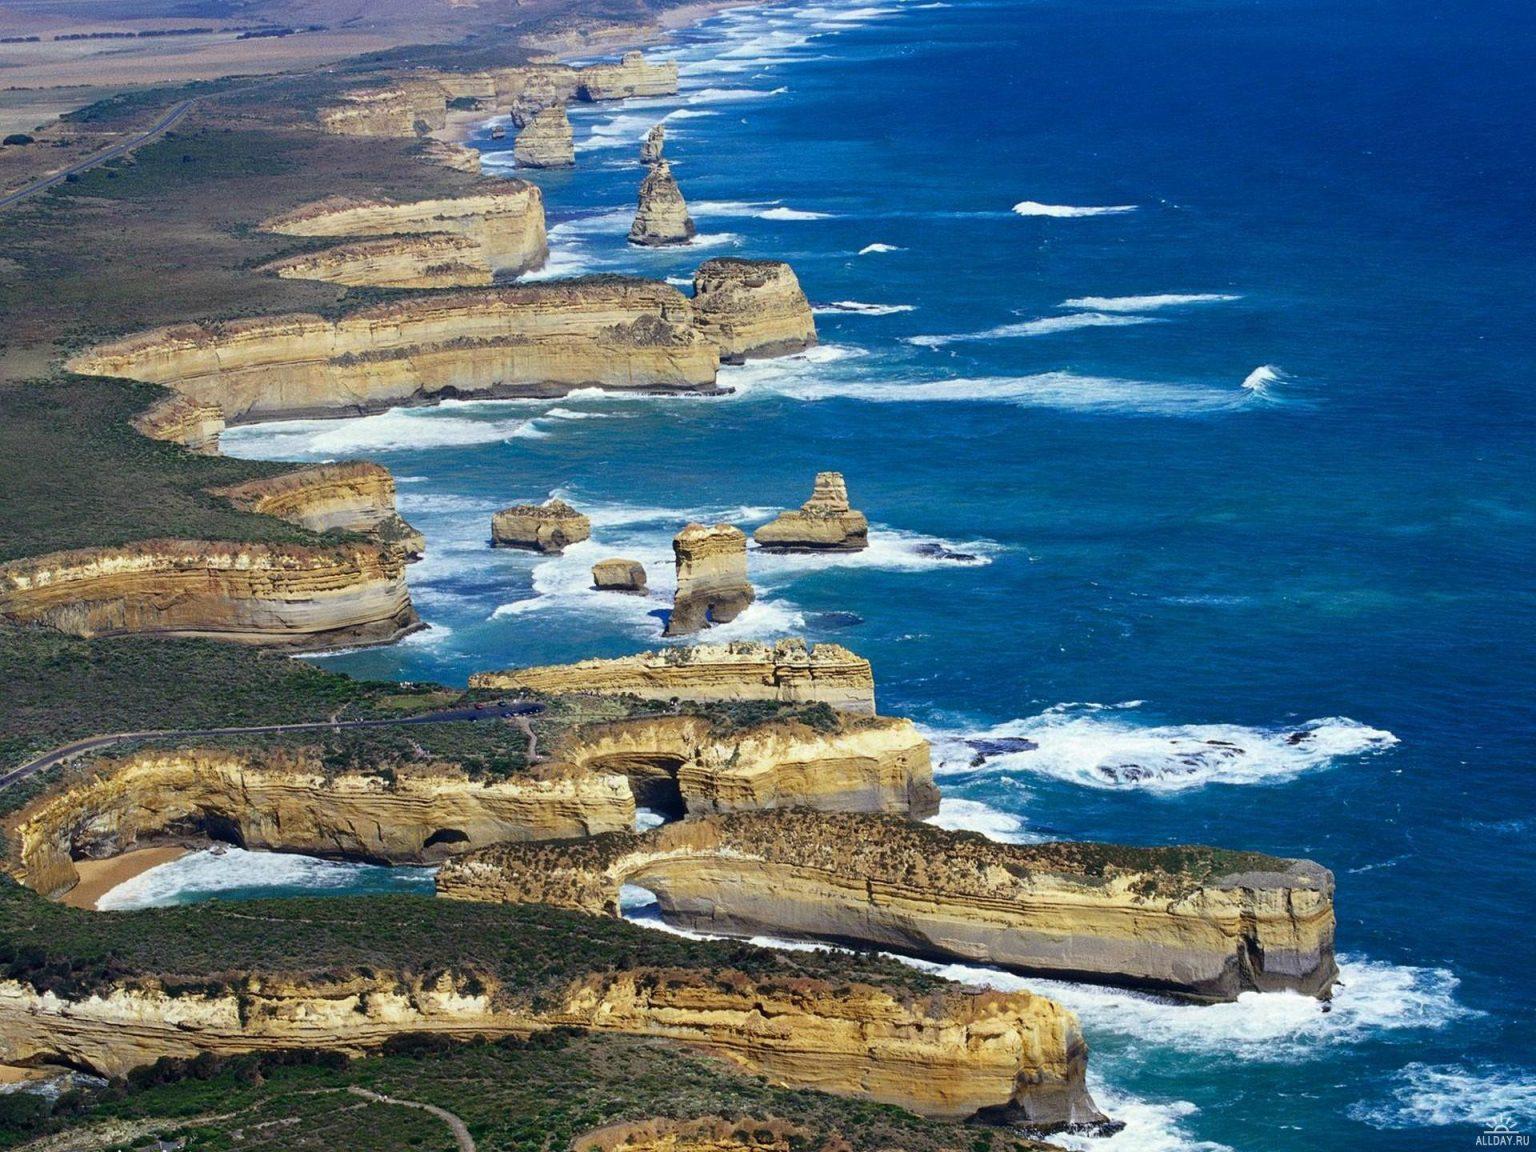 Shipwrek Coast